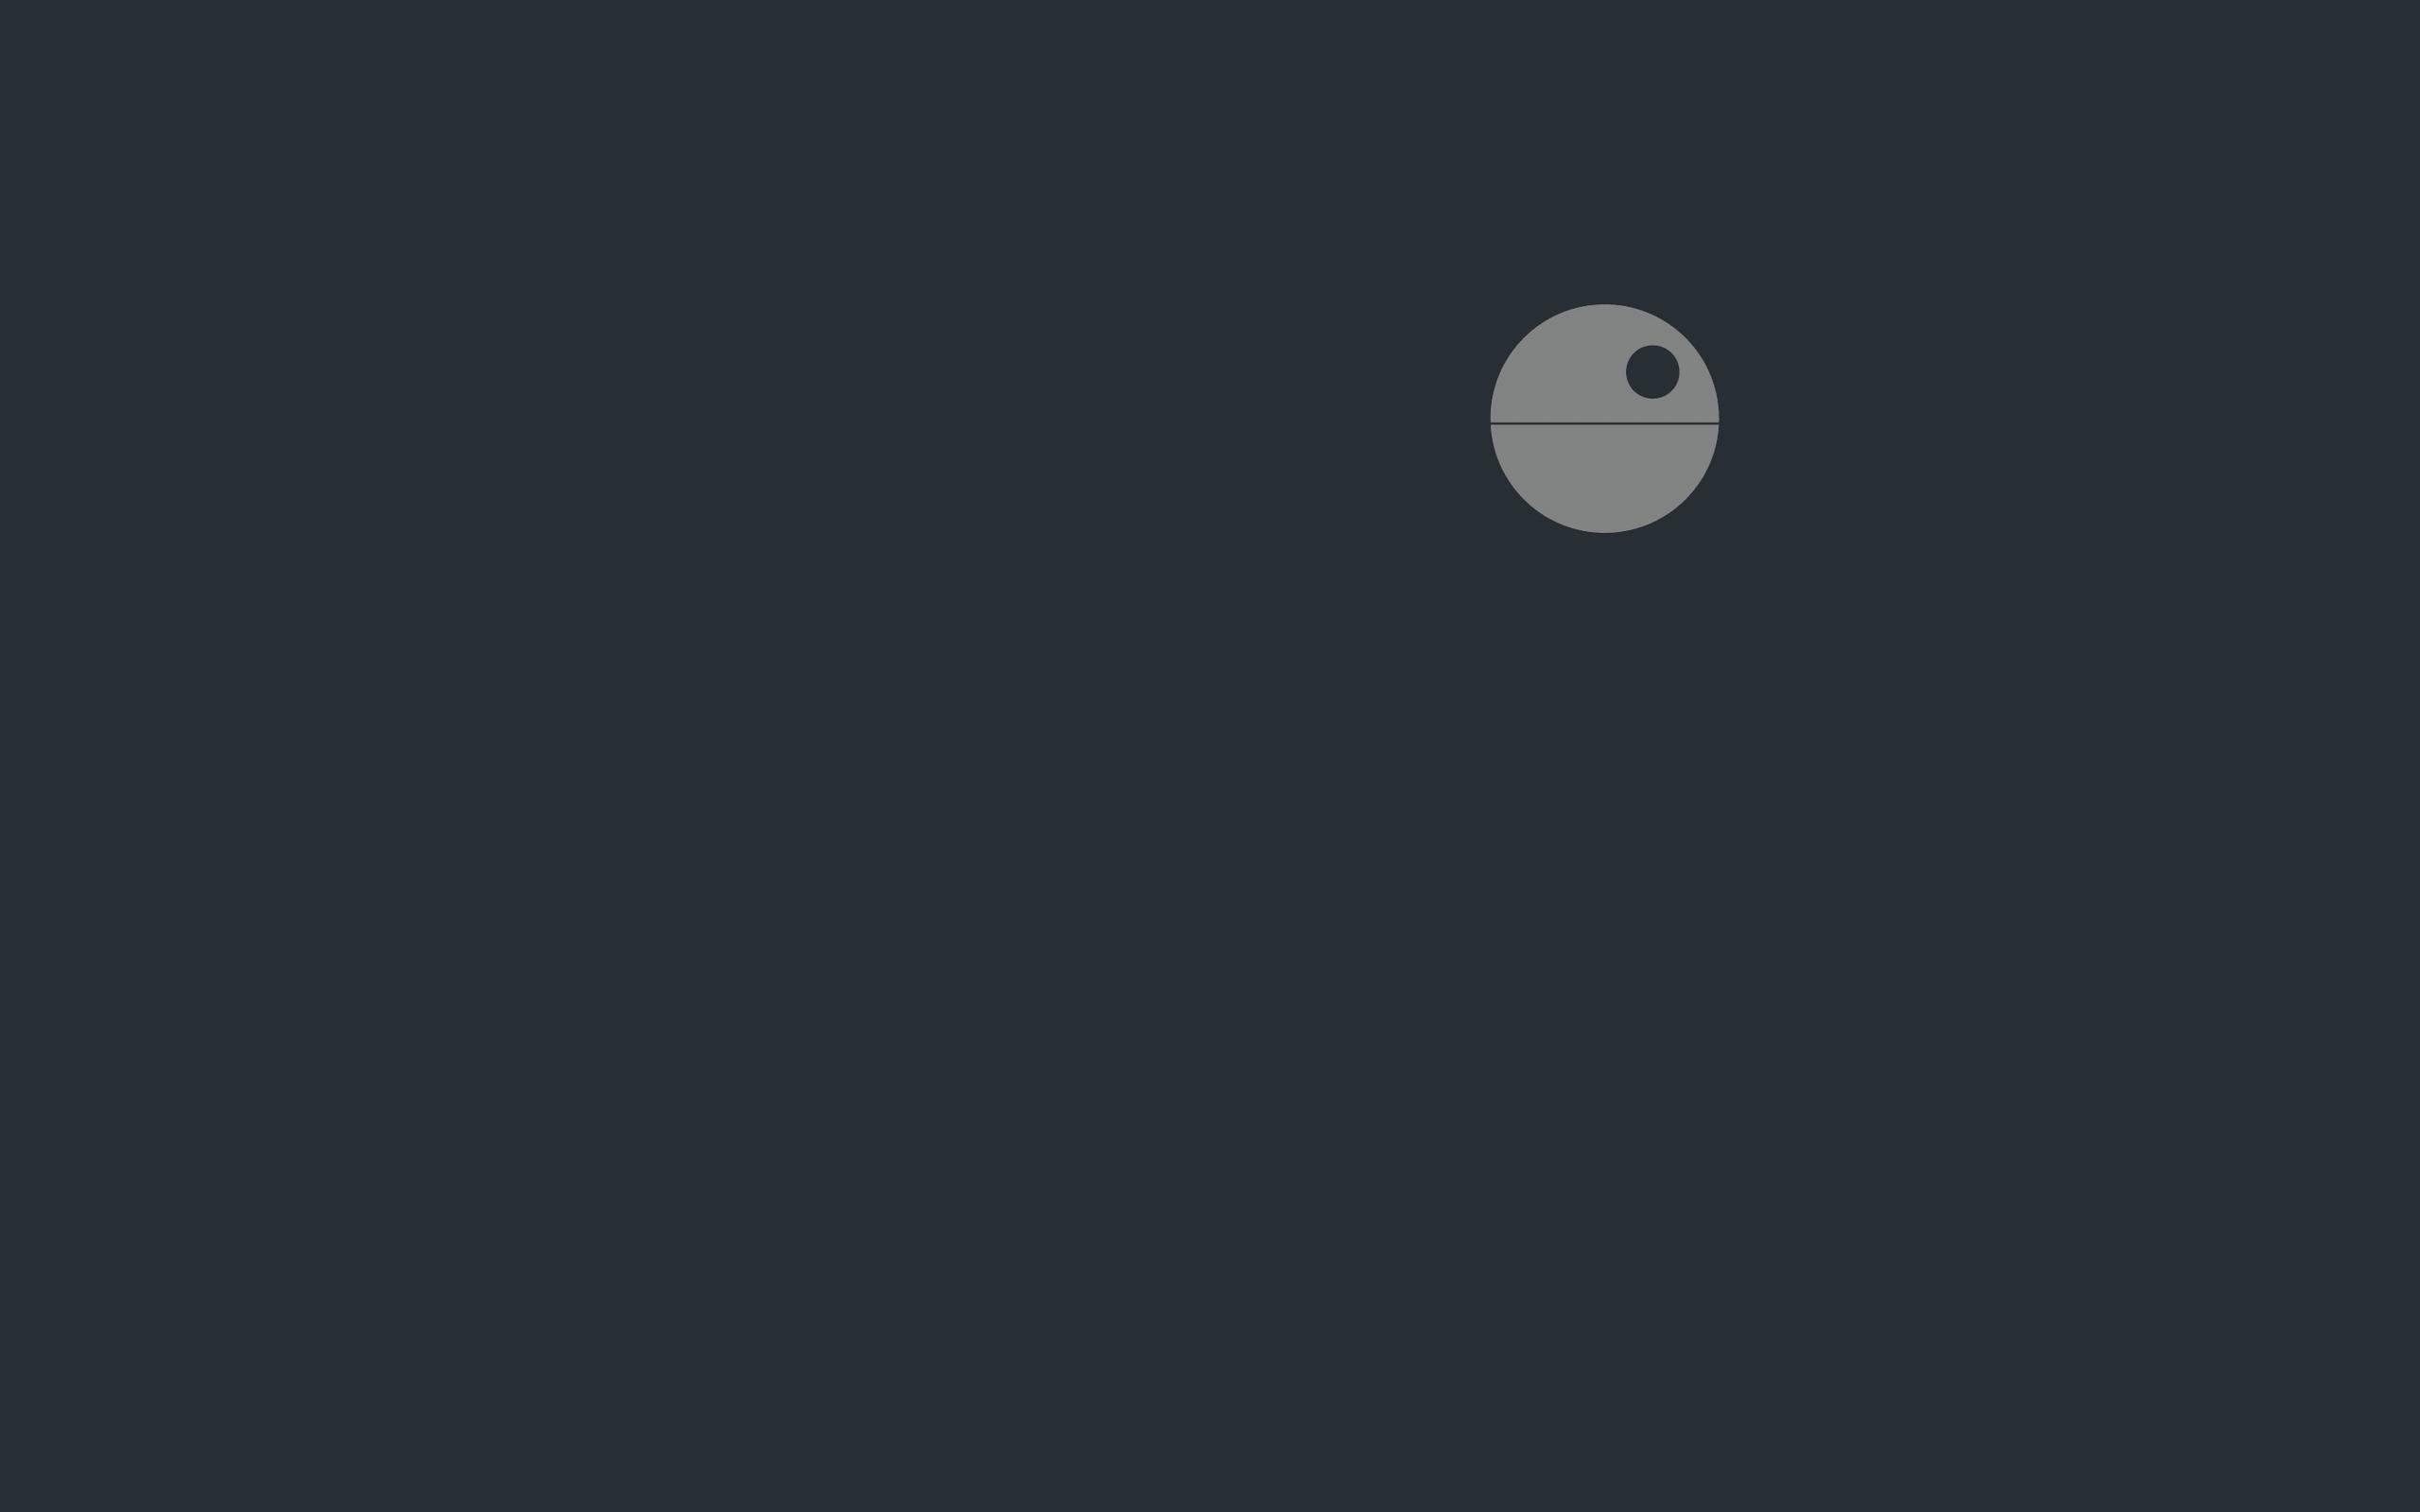 Papel De Parede Guerra Das Estrelas Minimalismo Logotipo Lua